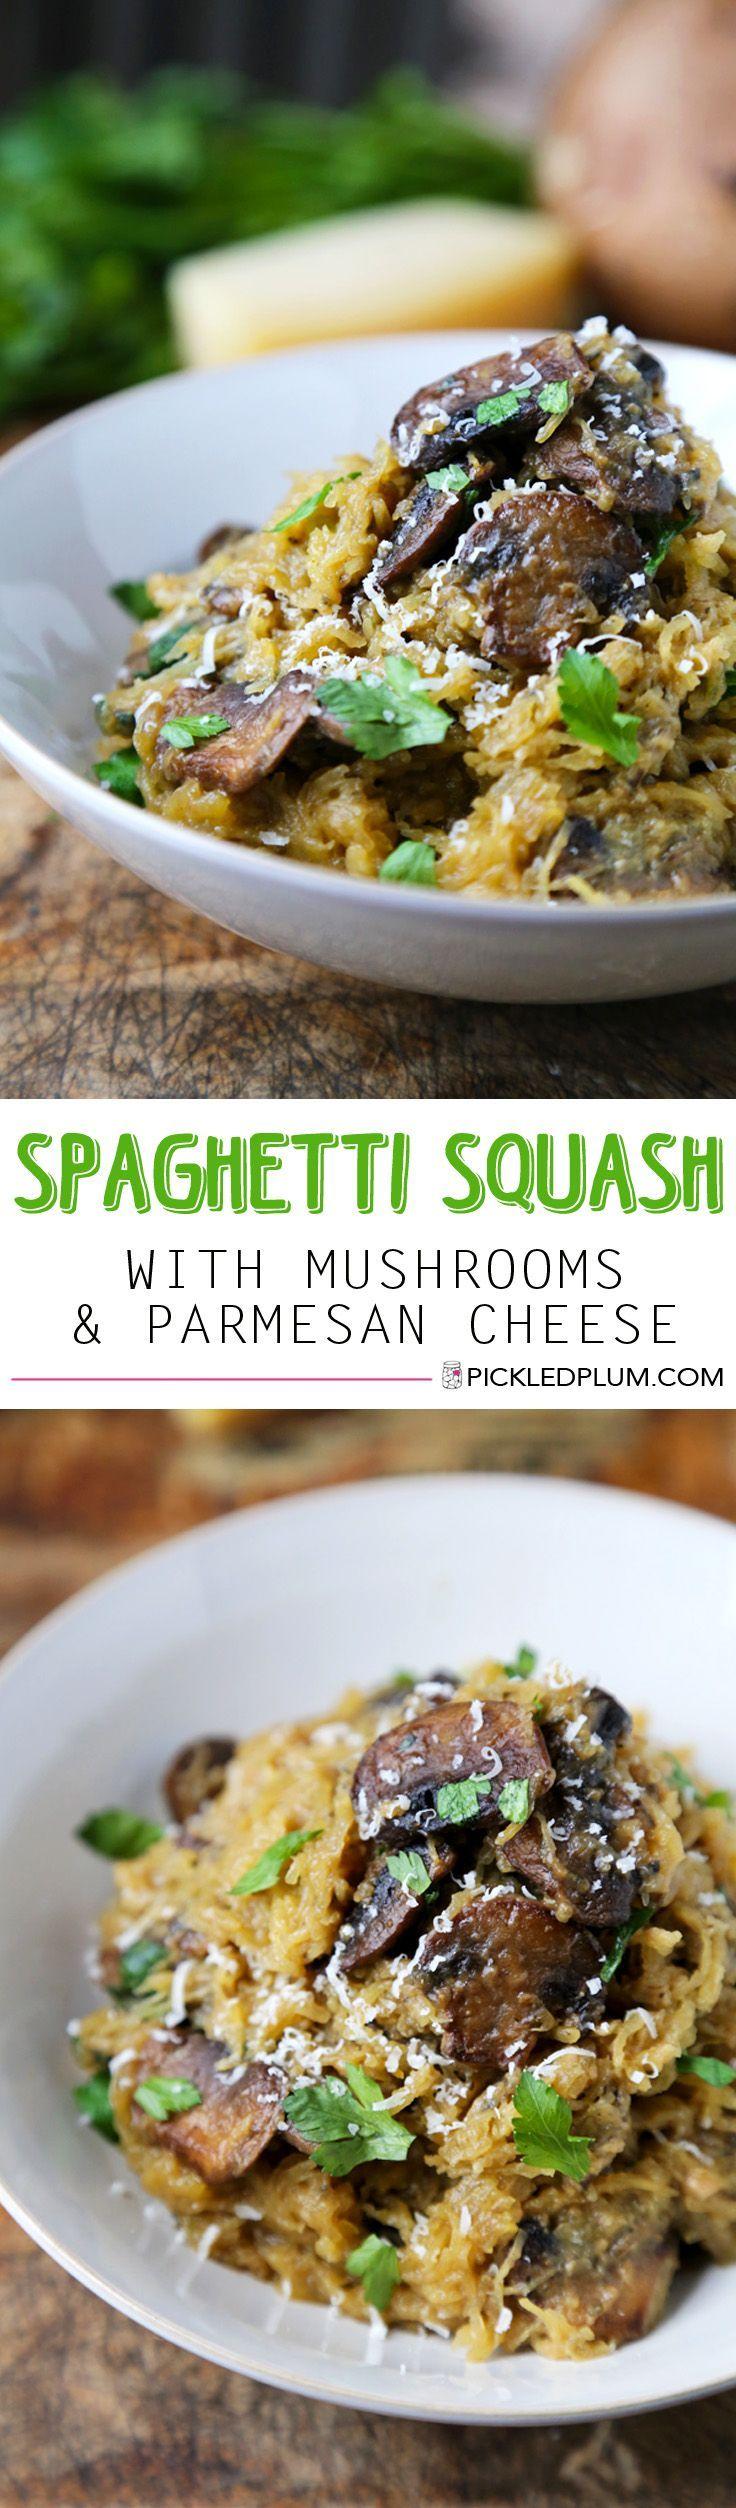 Spaghetti Squash Recipe With Mushrooms And Parmesan